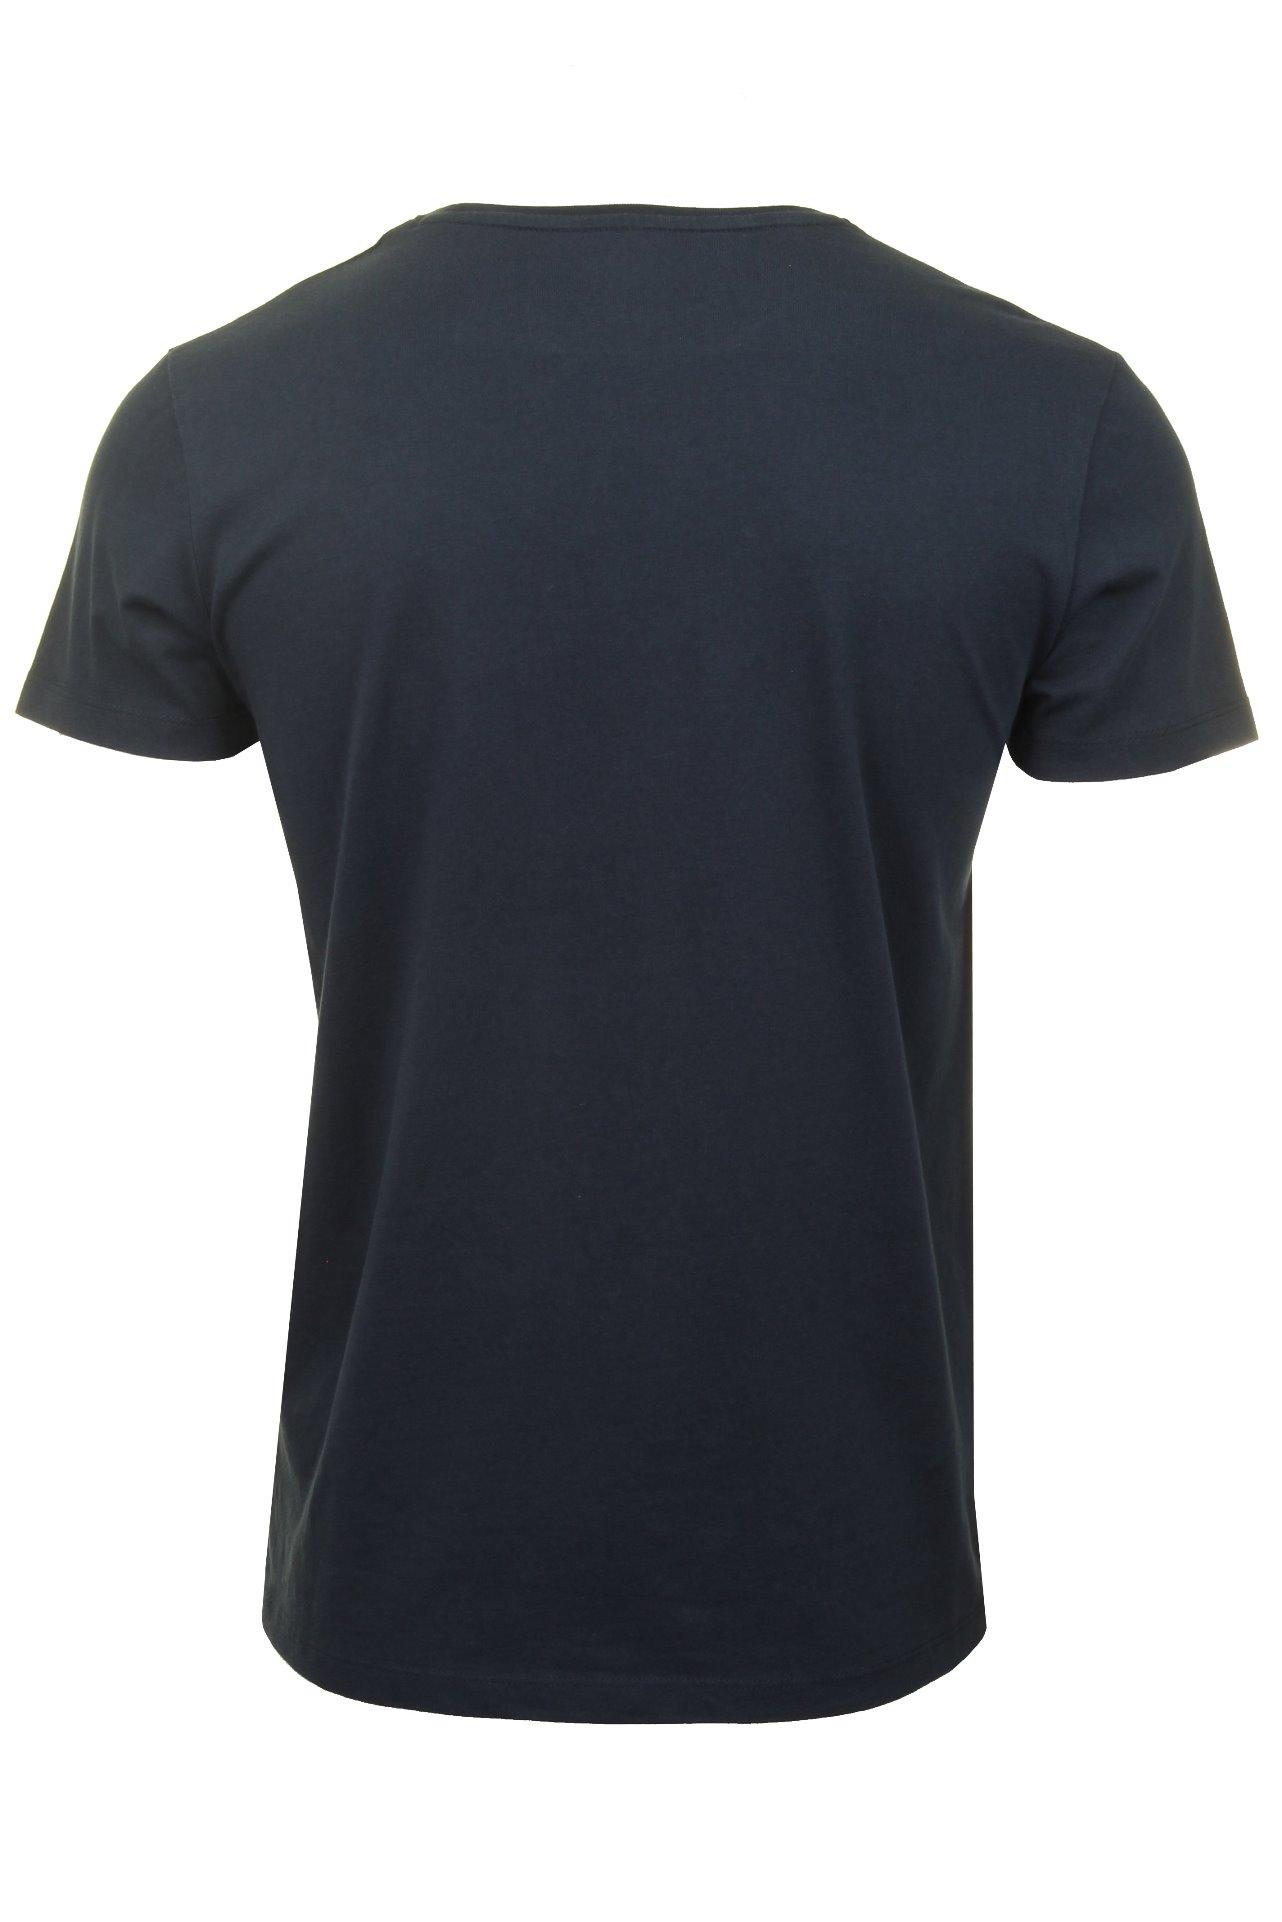 Timberland-Mens-Jersey-T-Shirt-039-Kennebec-Tree-Tee-039-Short-Sleeved thumbnail 8